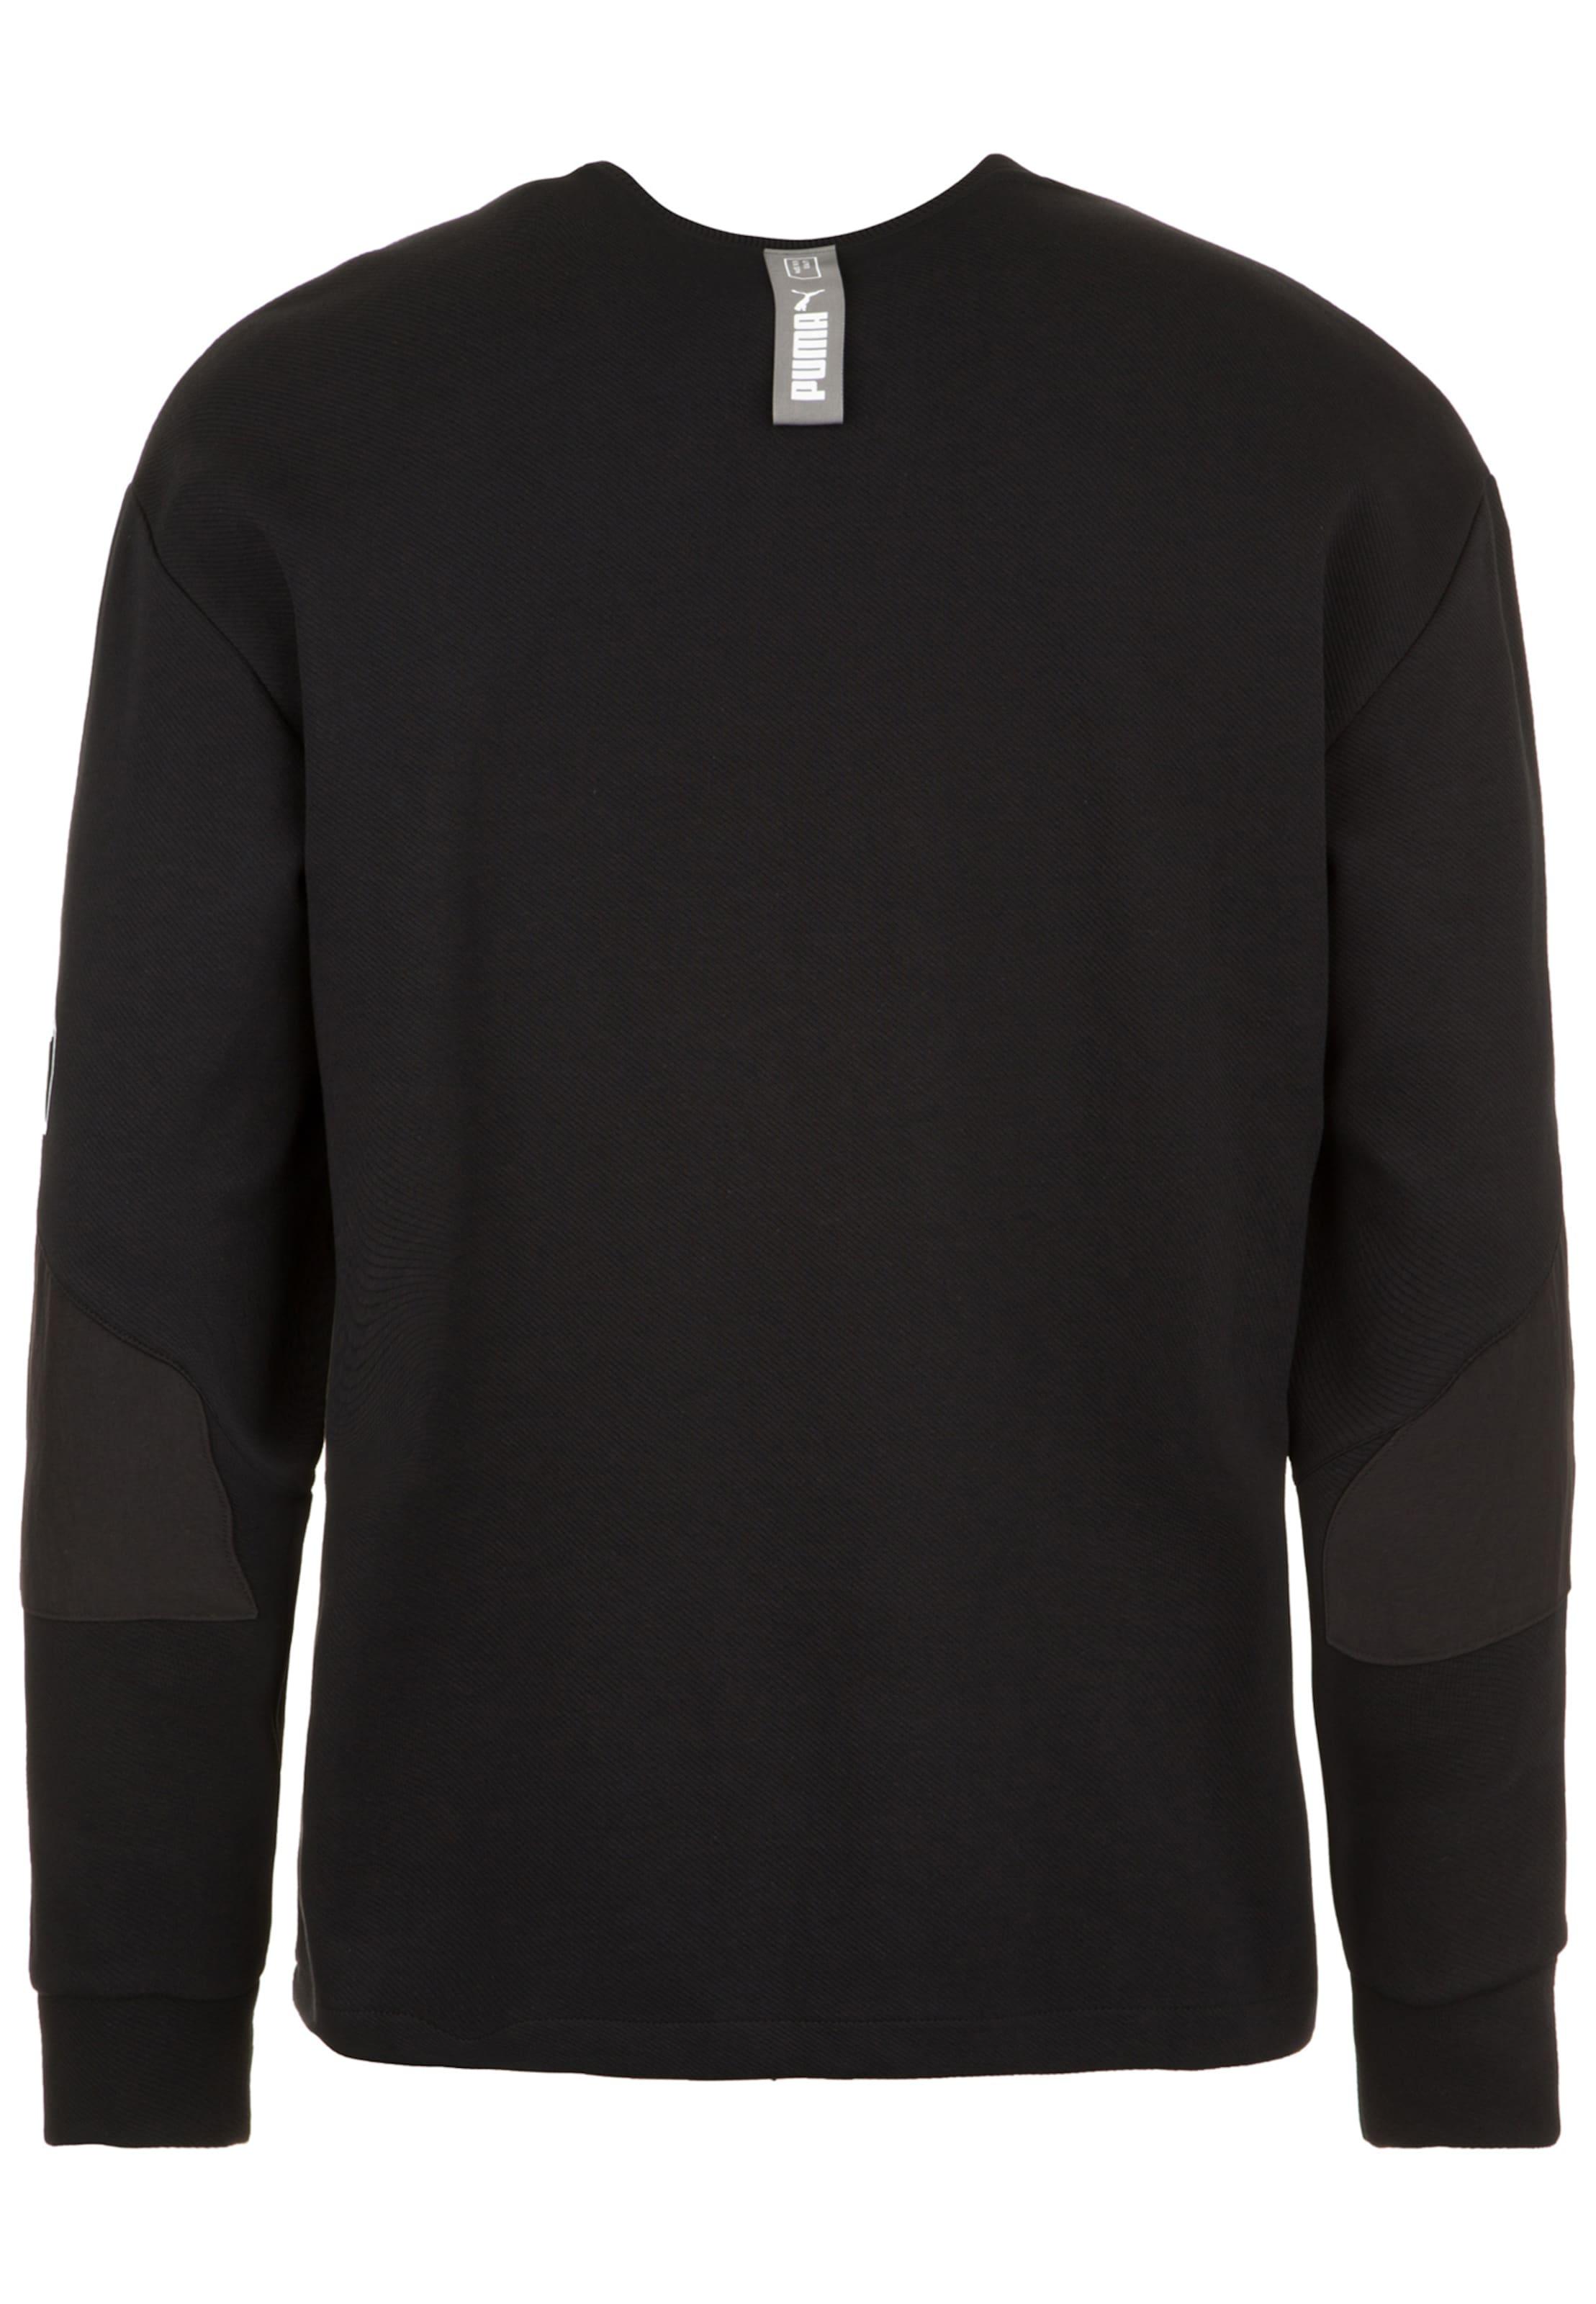 Sweatshirt In tility' SchwarzWeiß 'nu Puma l1uTFK35cJ